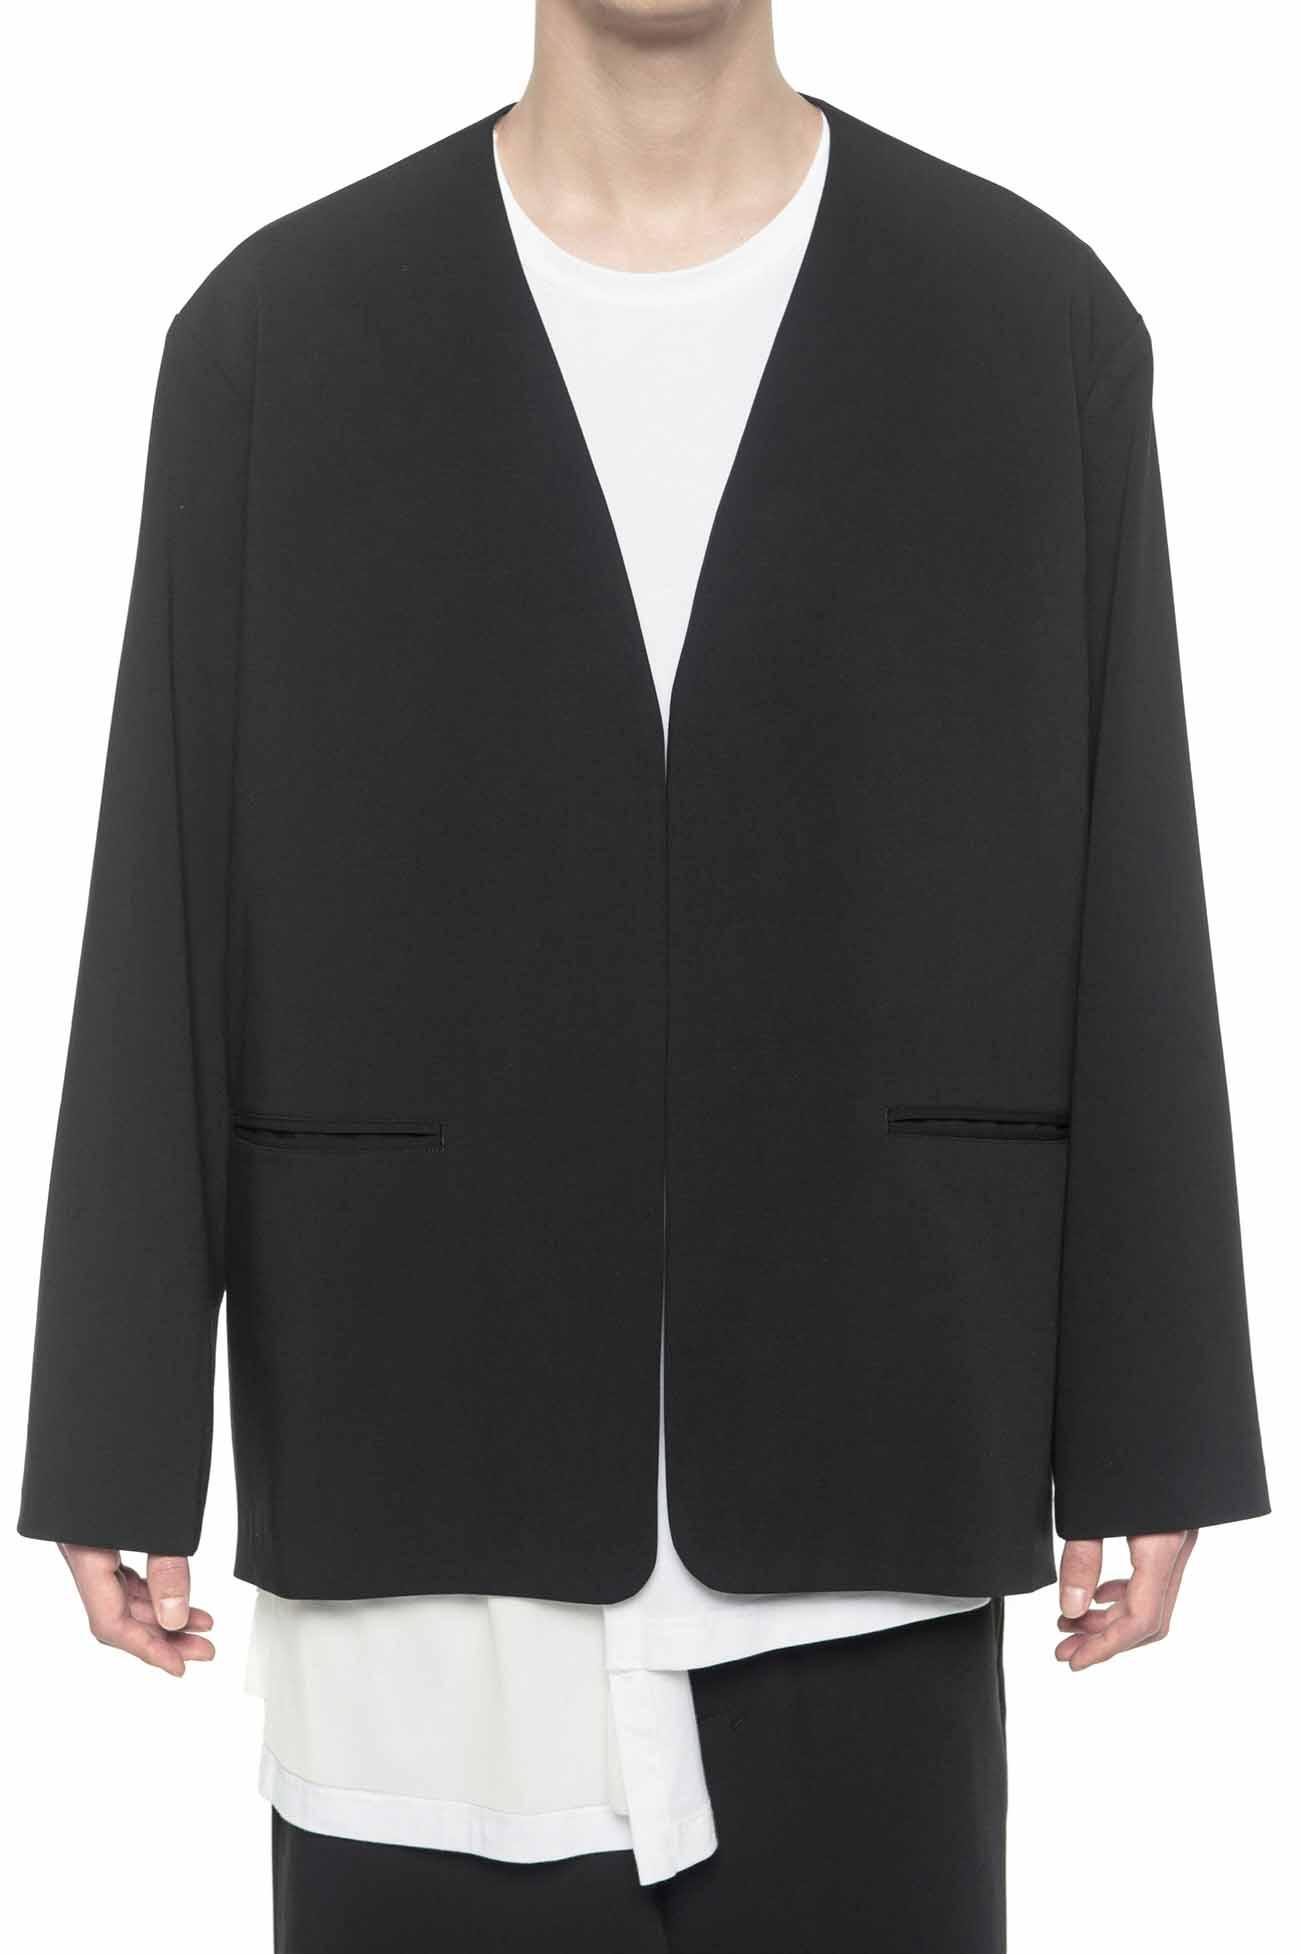 Pe/Rayon Gabardine No Collar Box Jacket